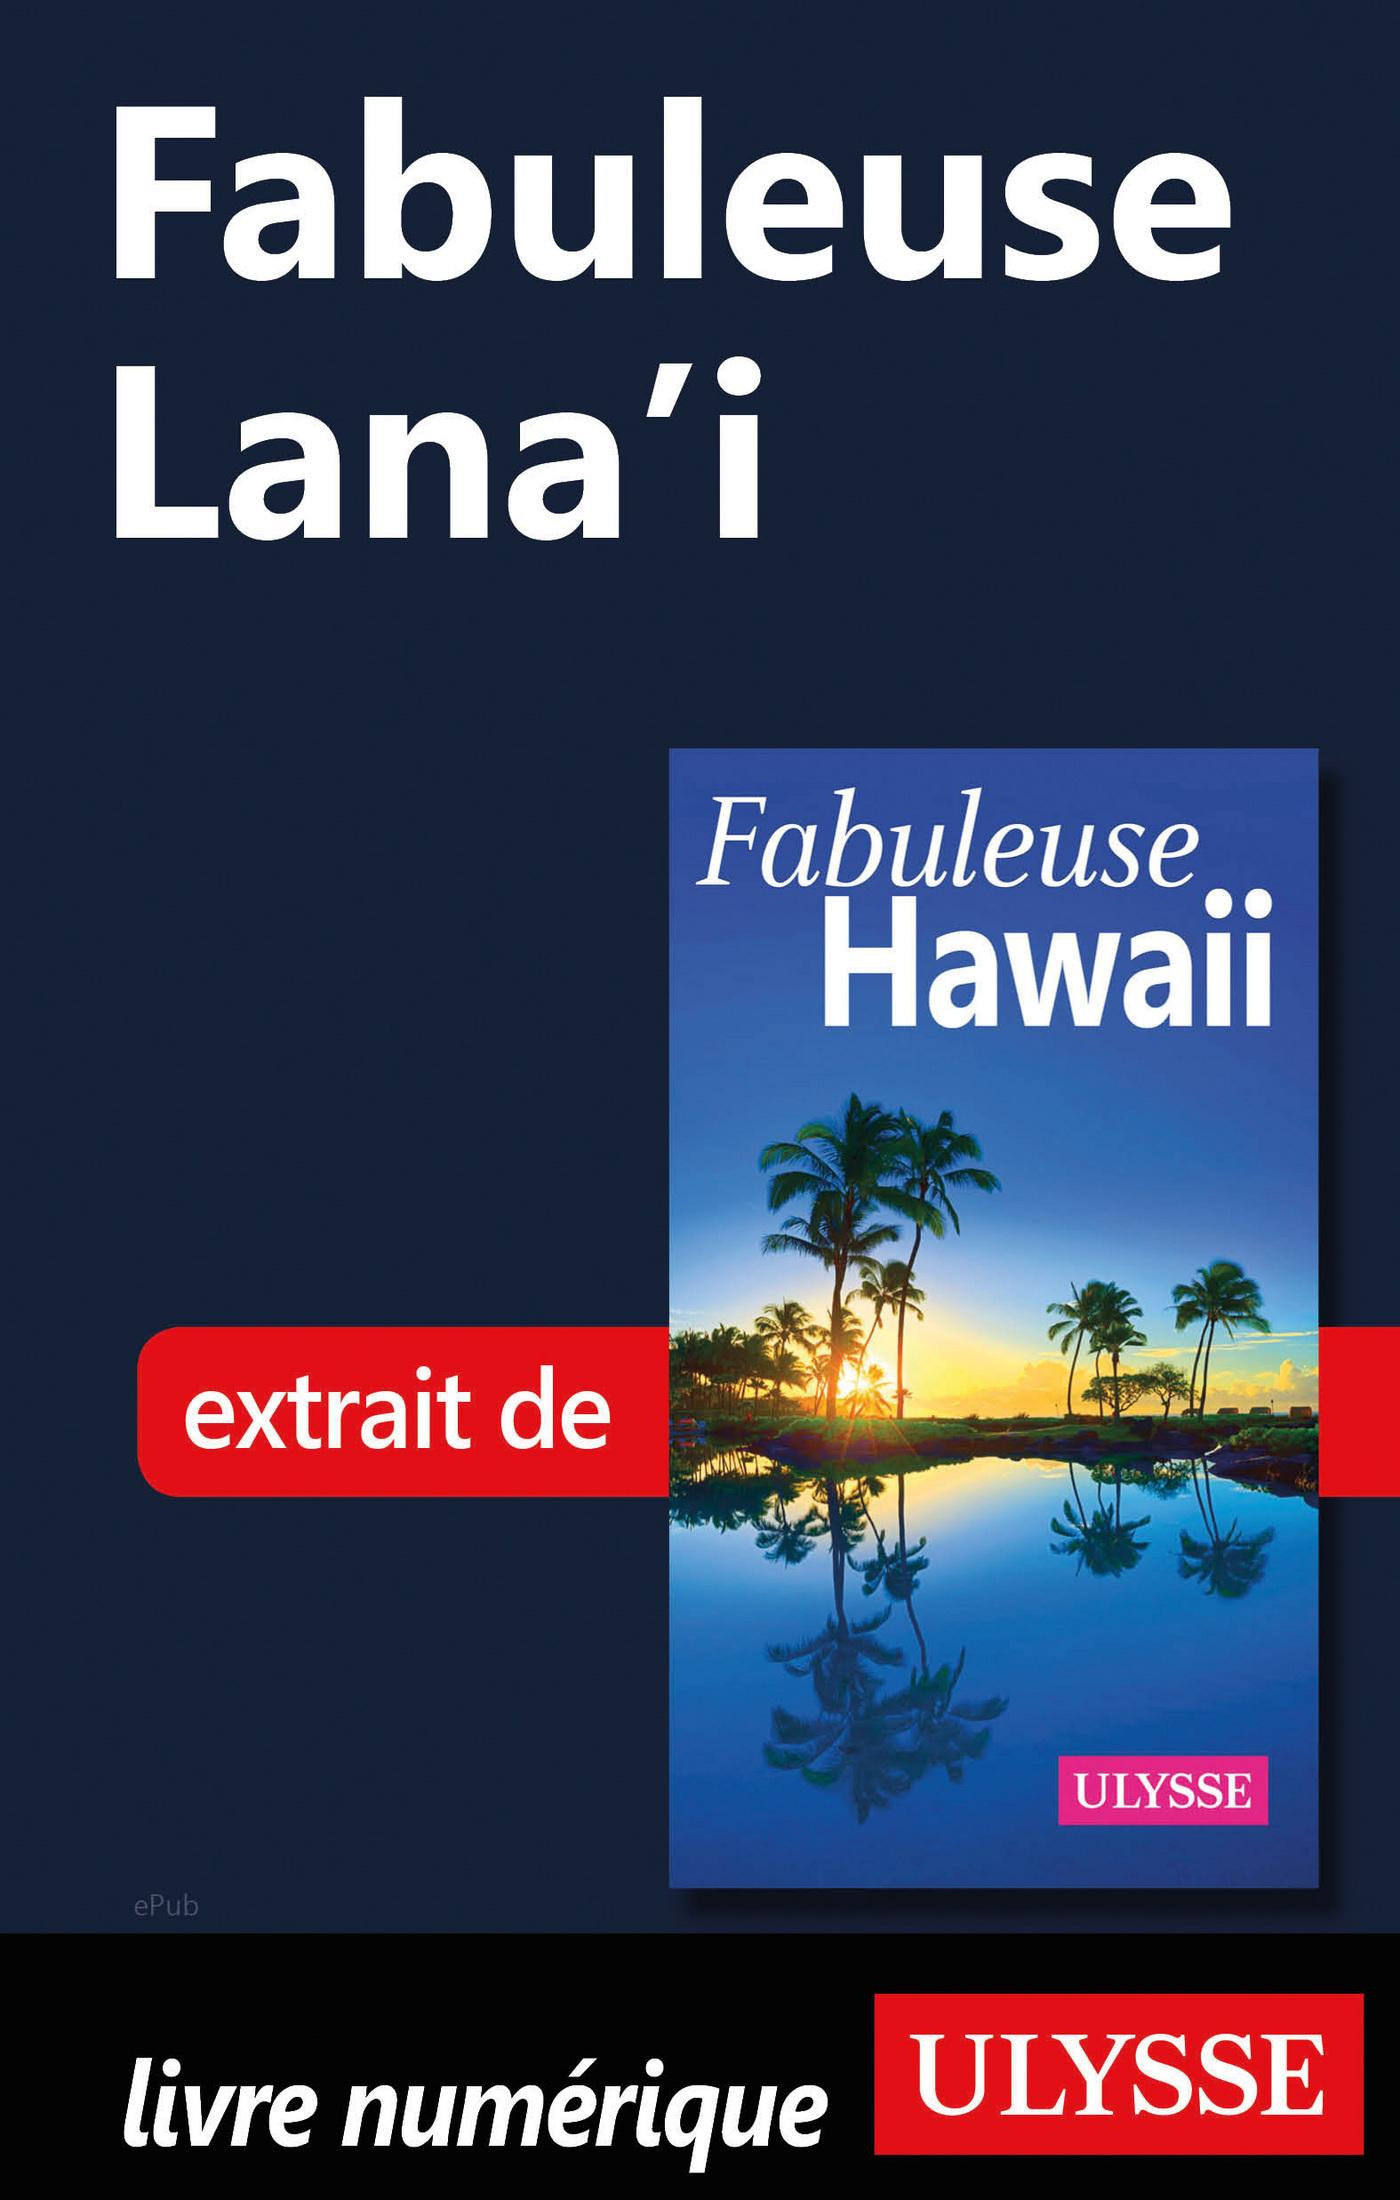 Fabuleuse Lana'i